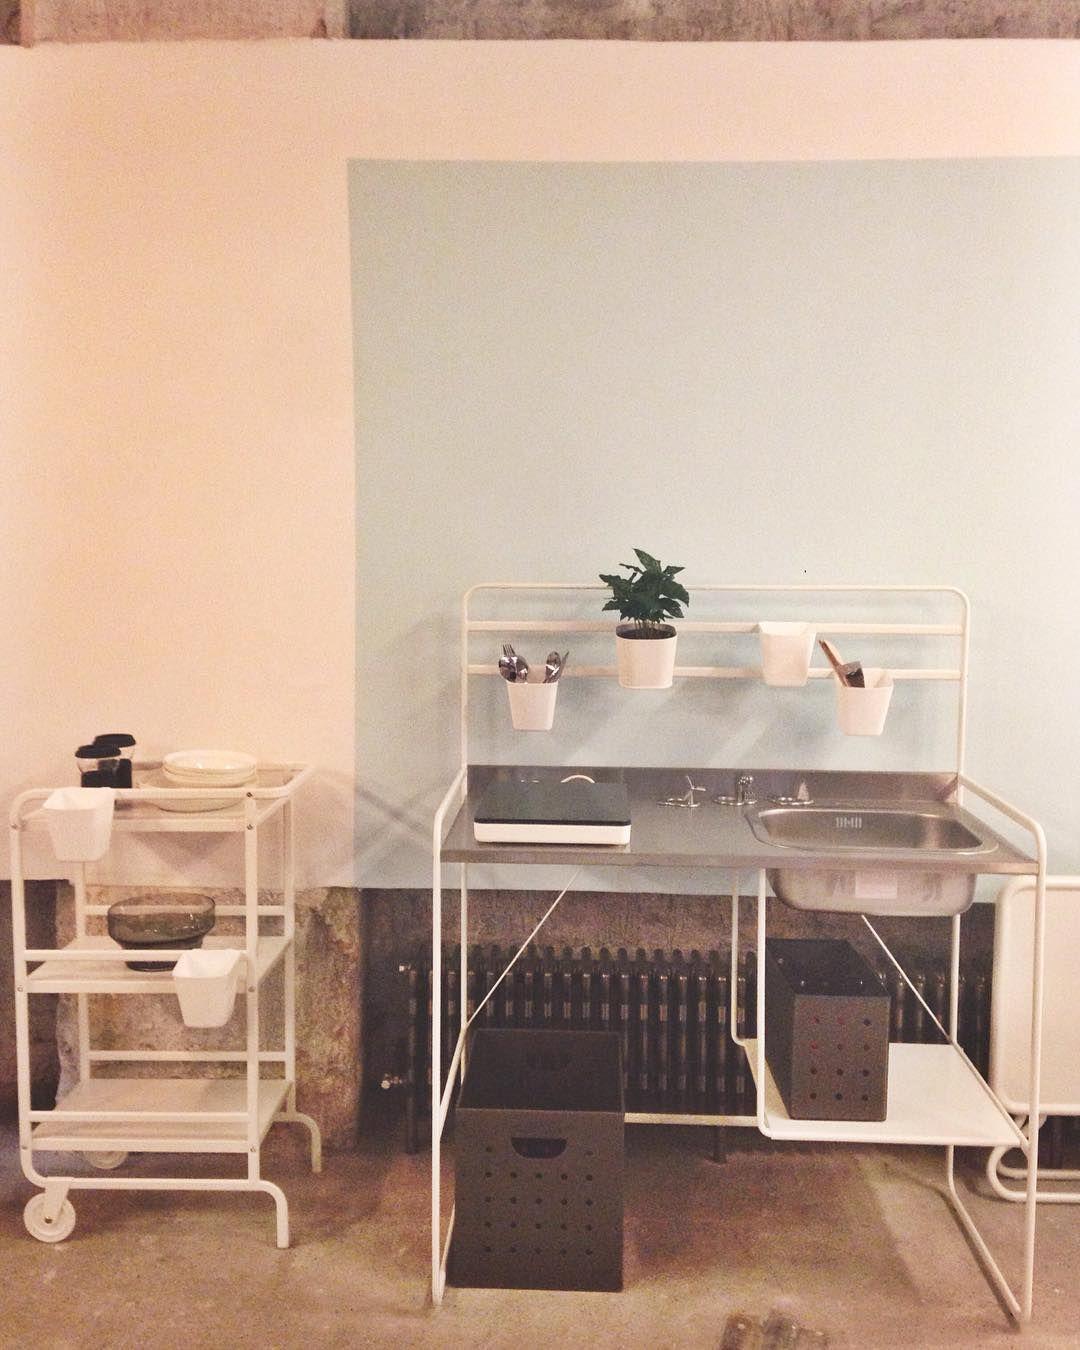 Milk Decoration Milkdecoration Magazine Photos Et Videos Instagram Decor Home Decor Home